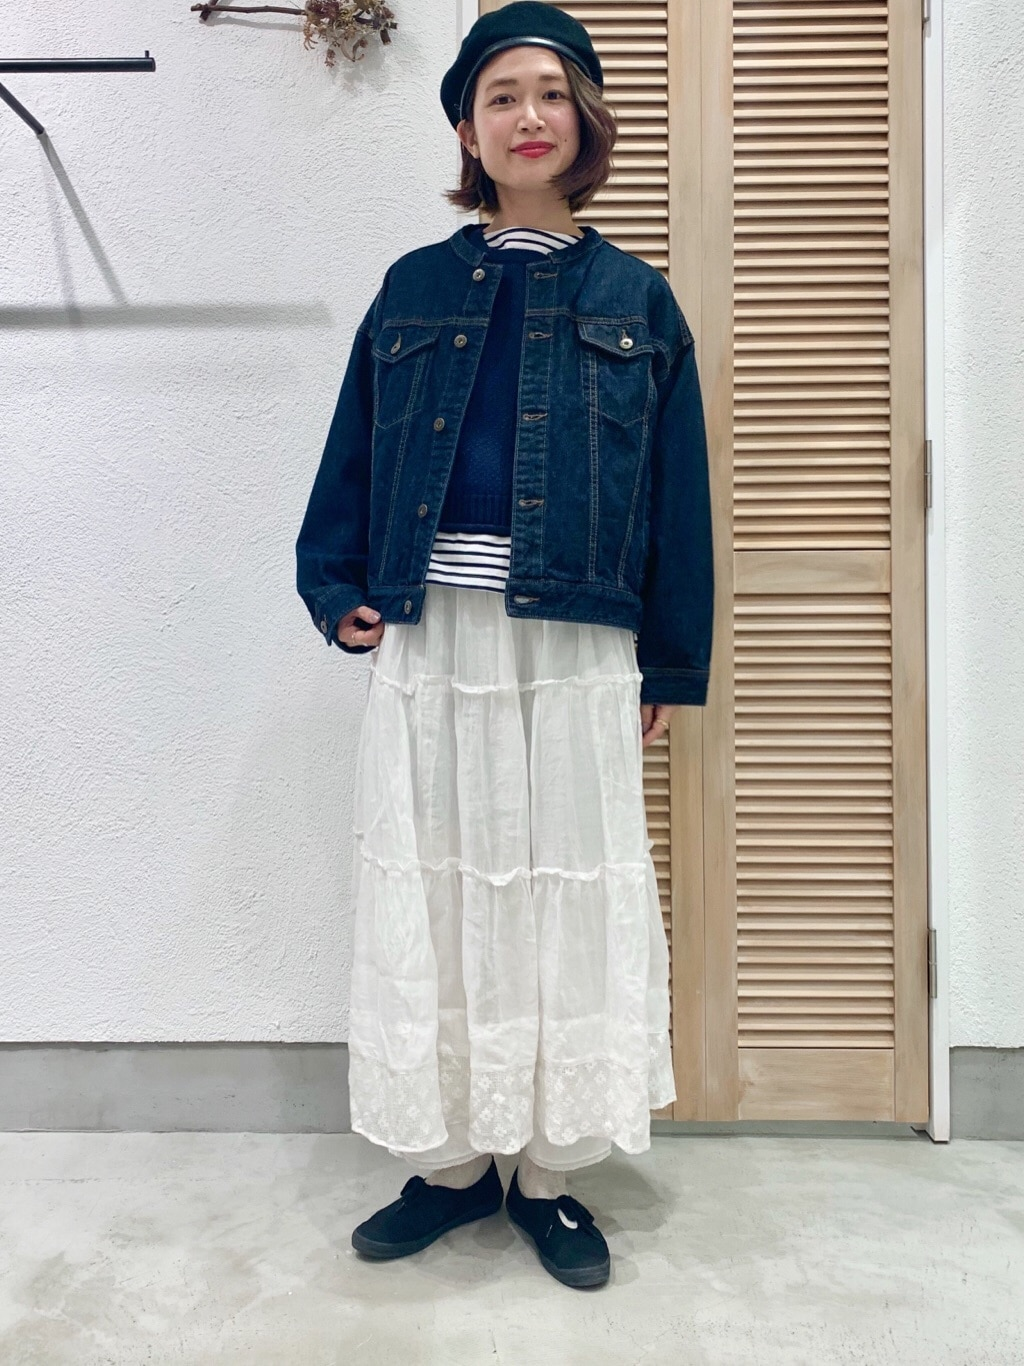 chambre de charme 横浜ジョイナス 身長:160cm 2021.02.13